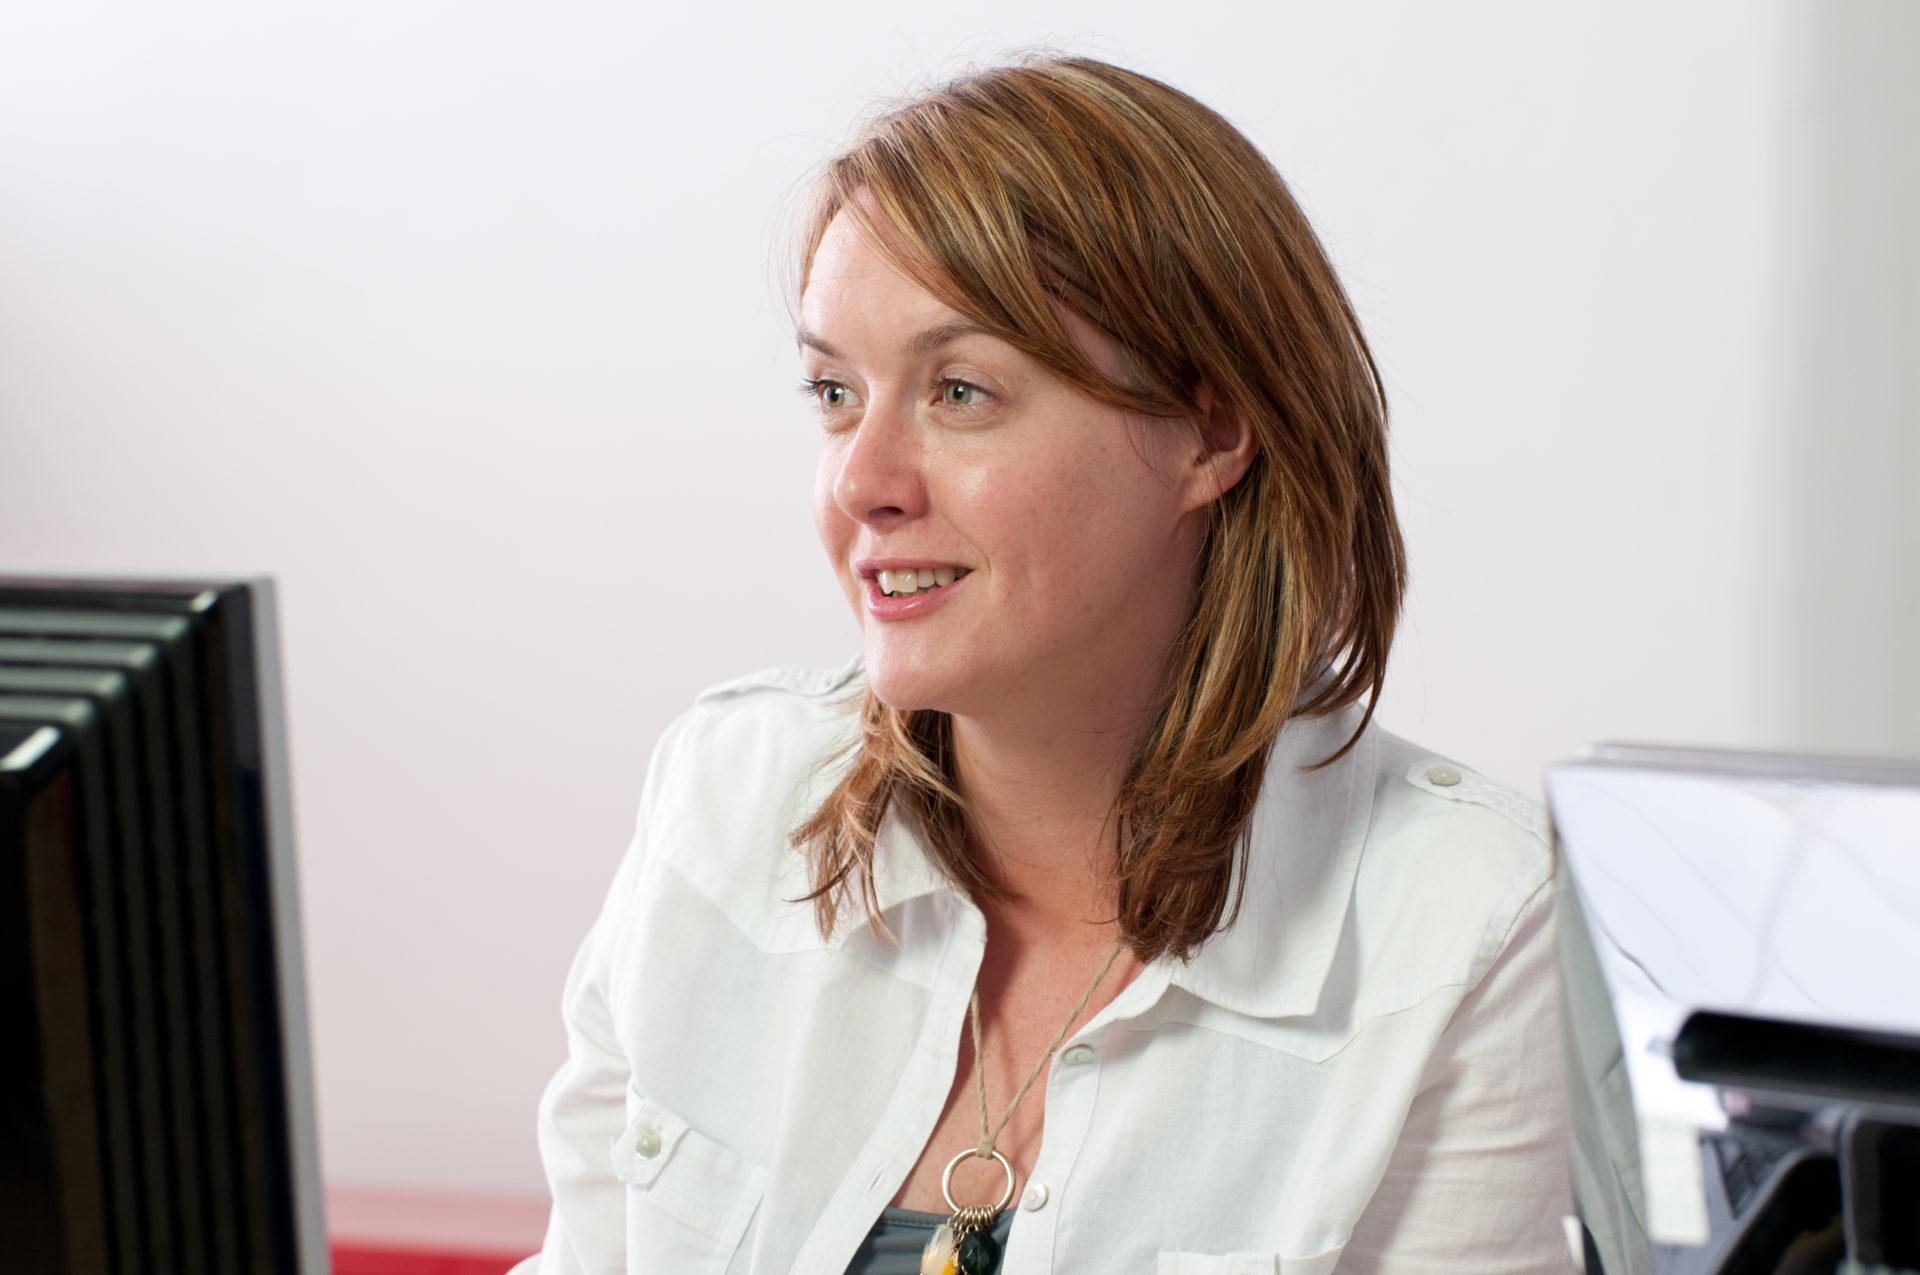 Hilary Stephenson managing director at Sigma